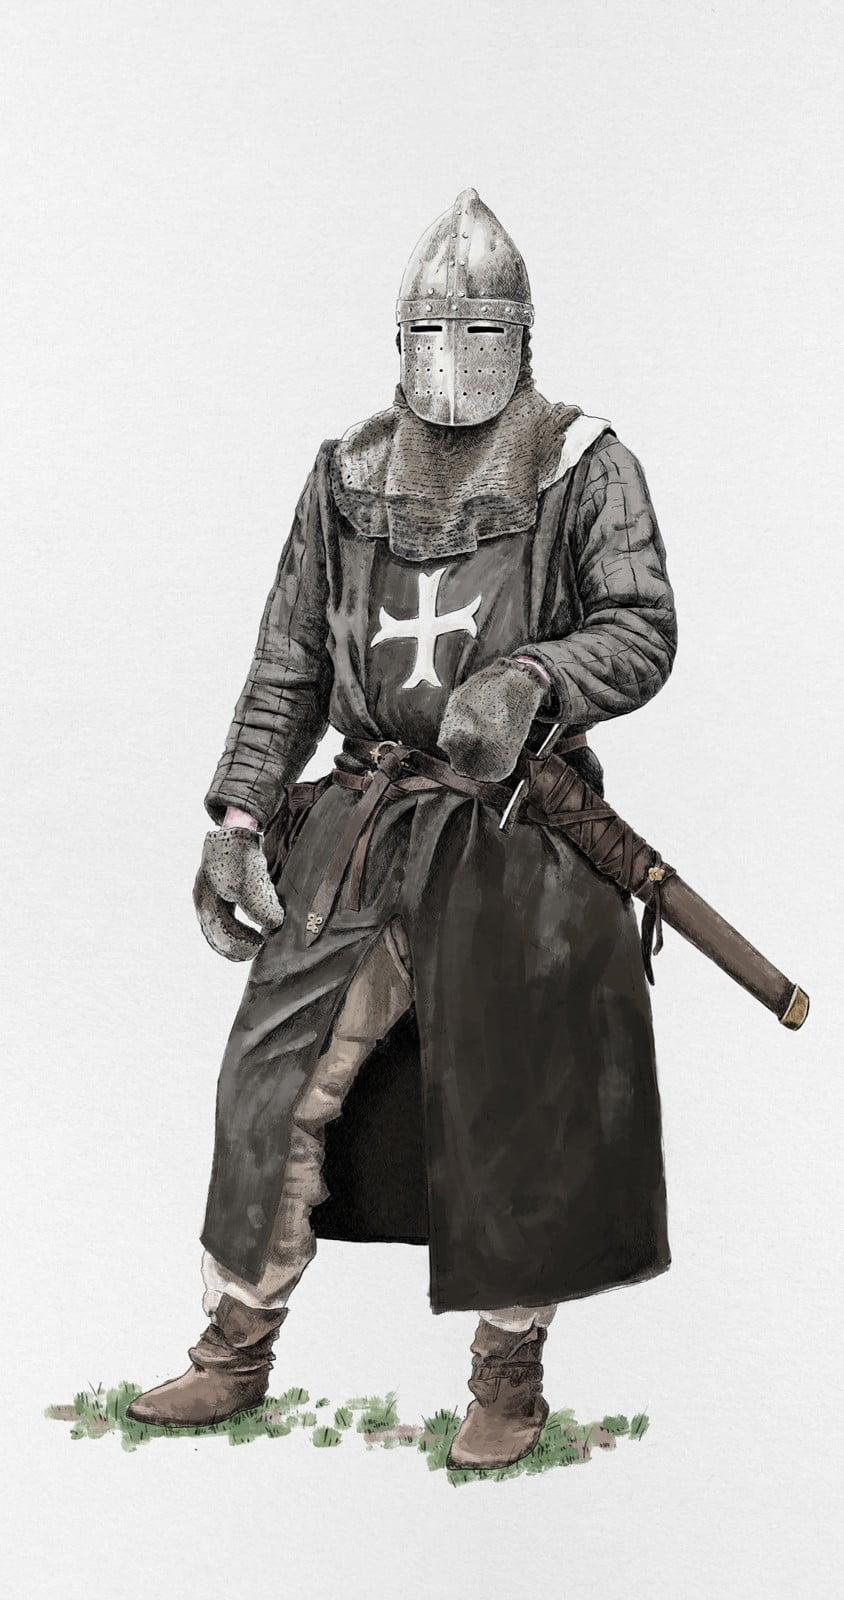 Medieval Knight, krak, ikonaut